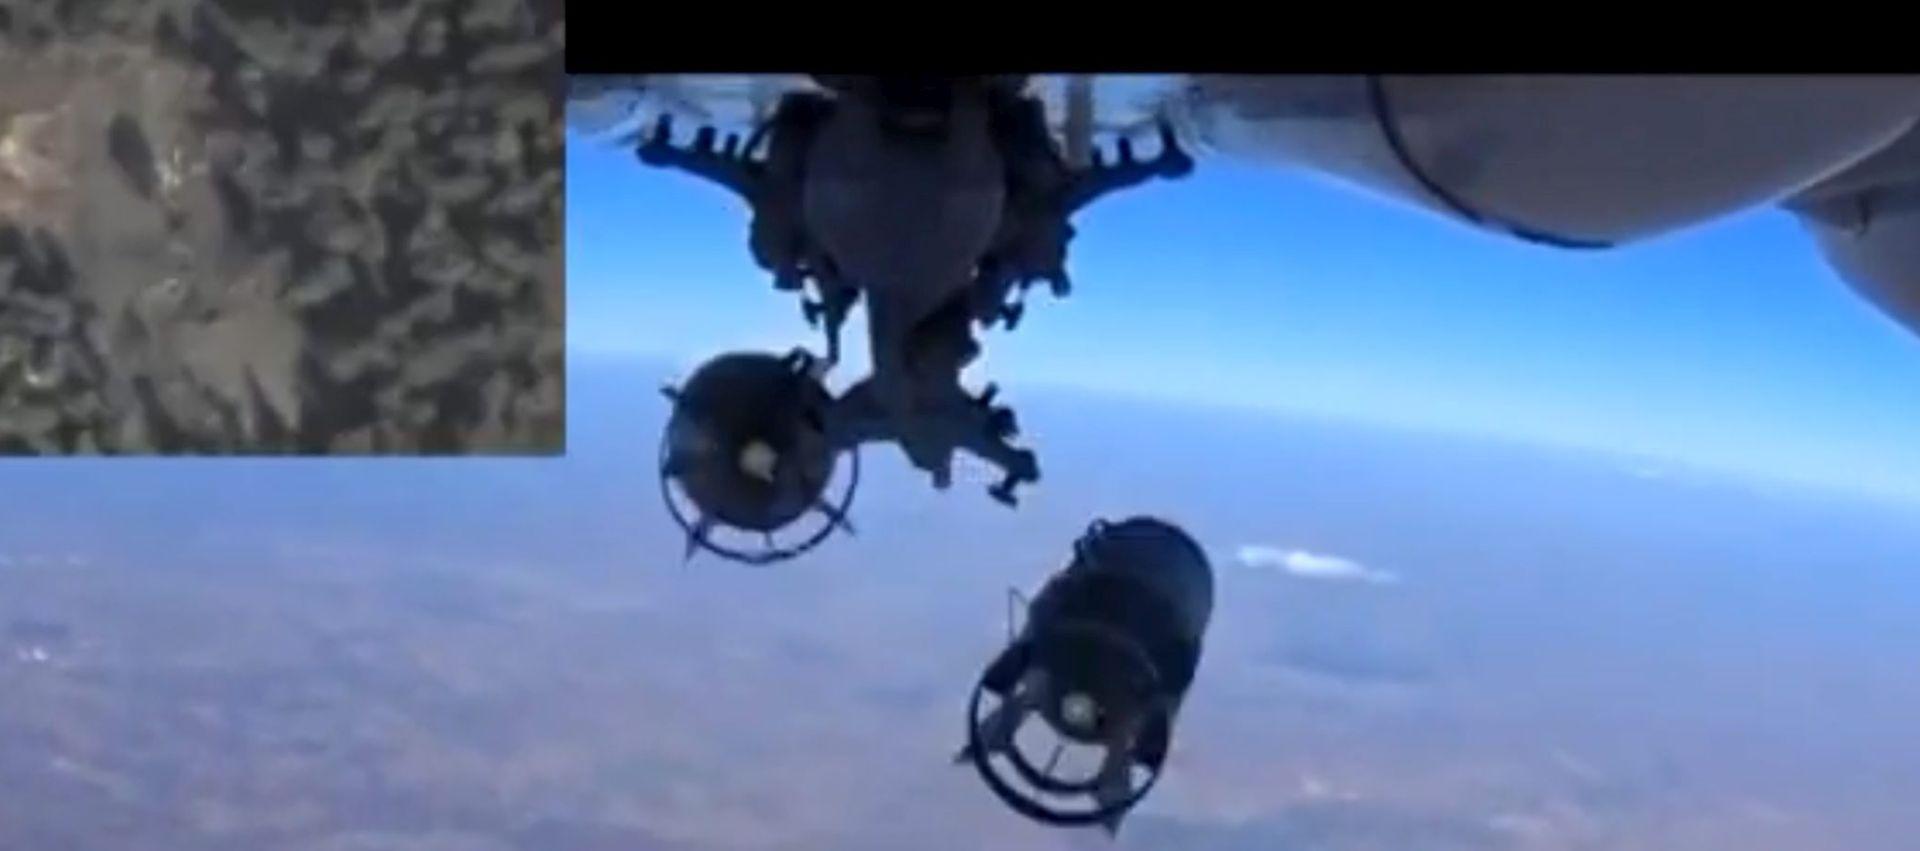 RUSKA KAMPANJA SE NASTAVLJA: Kod Palmire uništeno 20 ISIS-ovih tenkova, skladište oružja dignuto u zrak